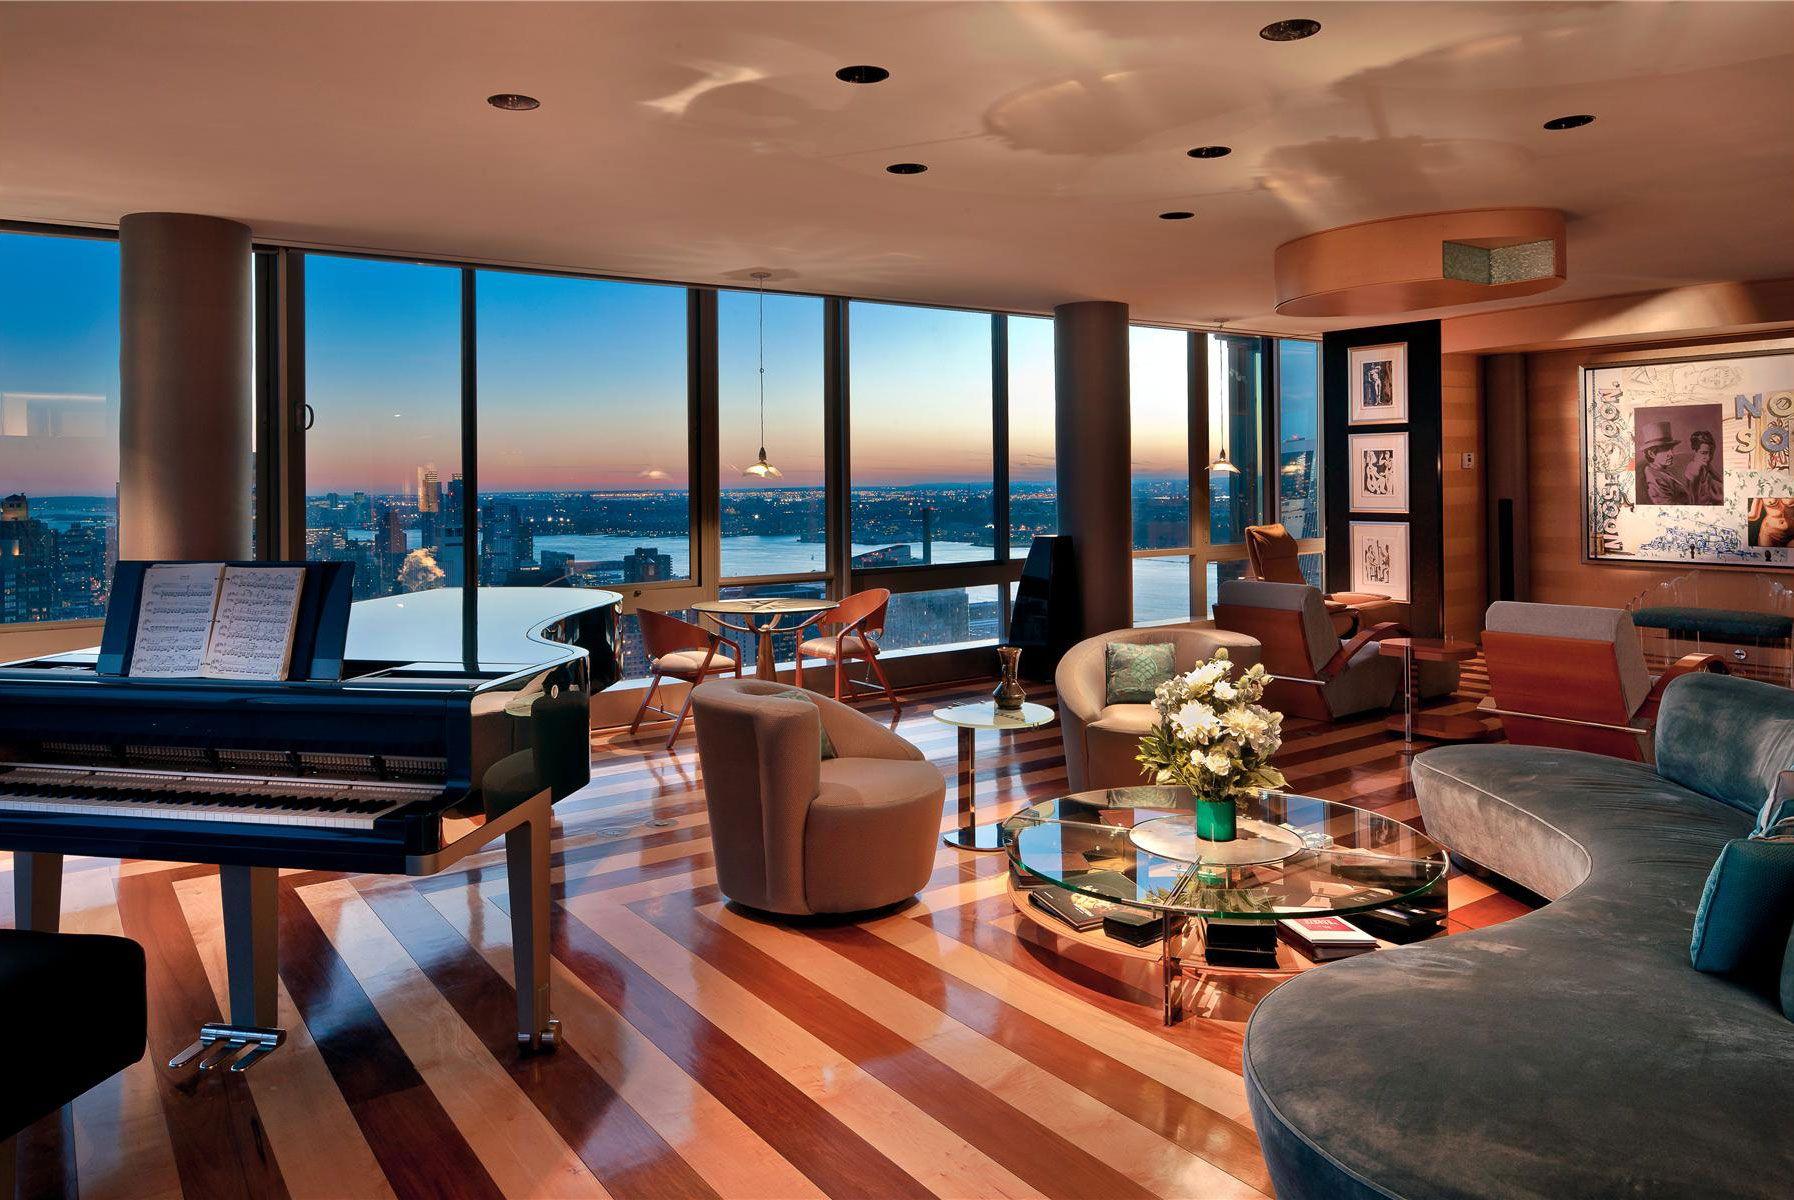 The gartner penthouse for sale in new york city for Luxury penthouses in new york